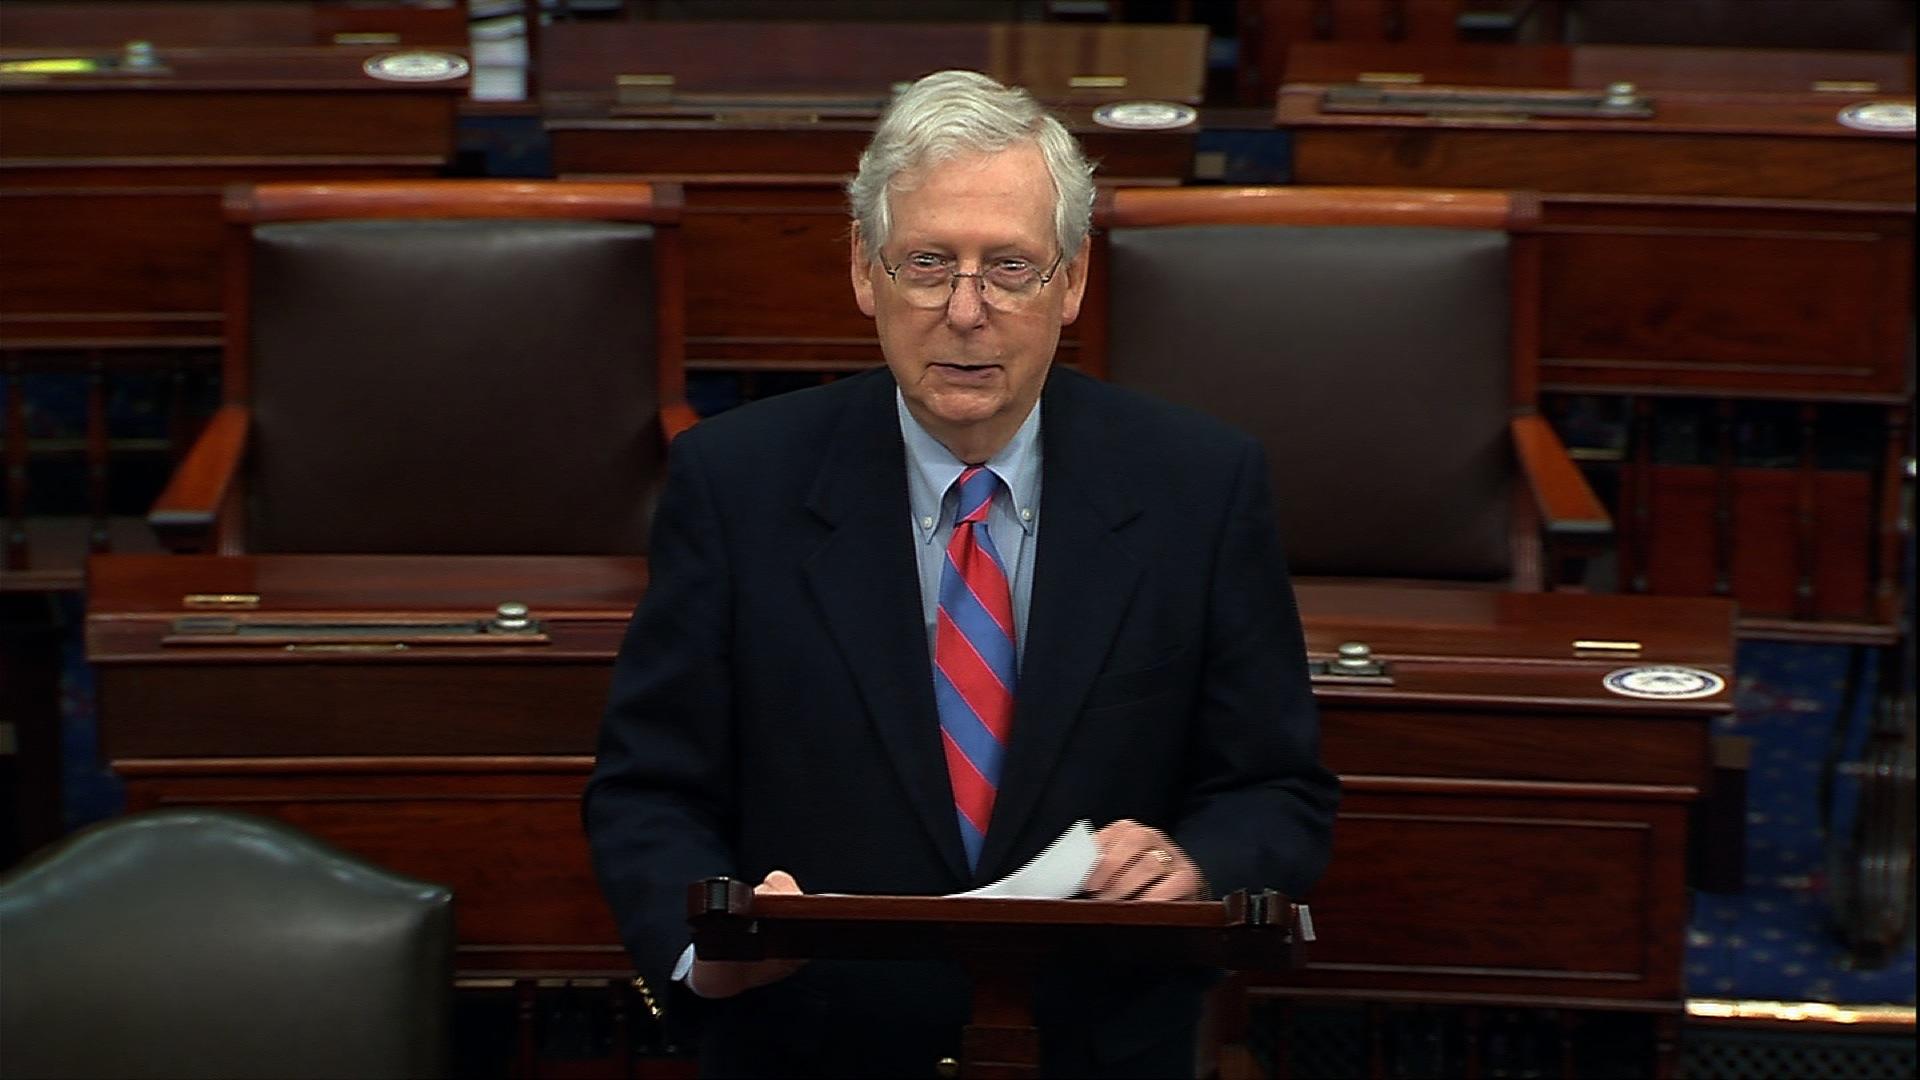 Senate Majority Leader Mitch McConnell speaks on the Senate floor in Washington, DC, on November 30.